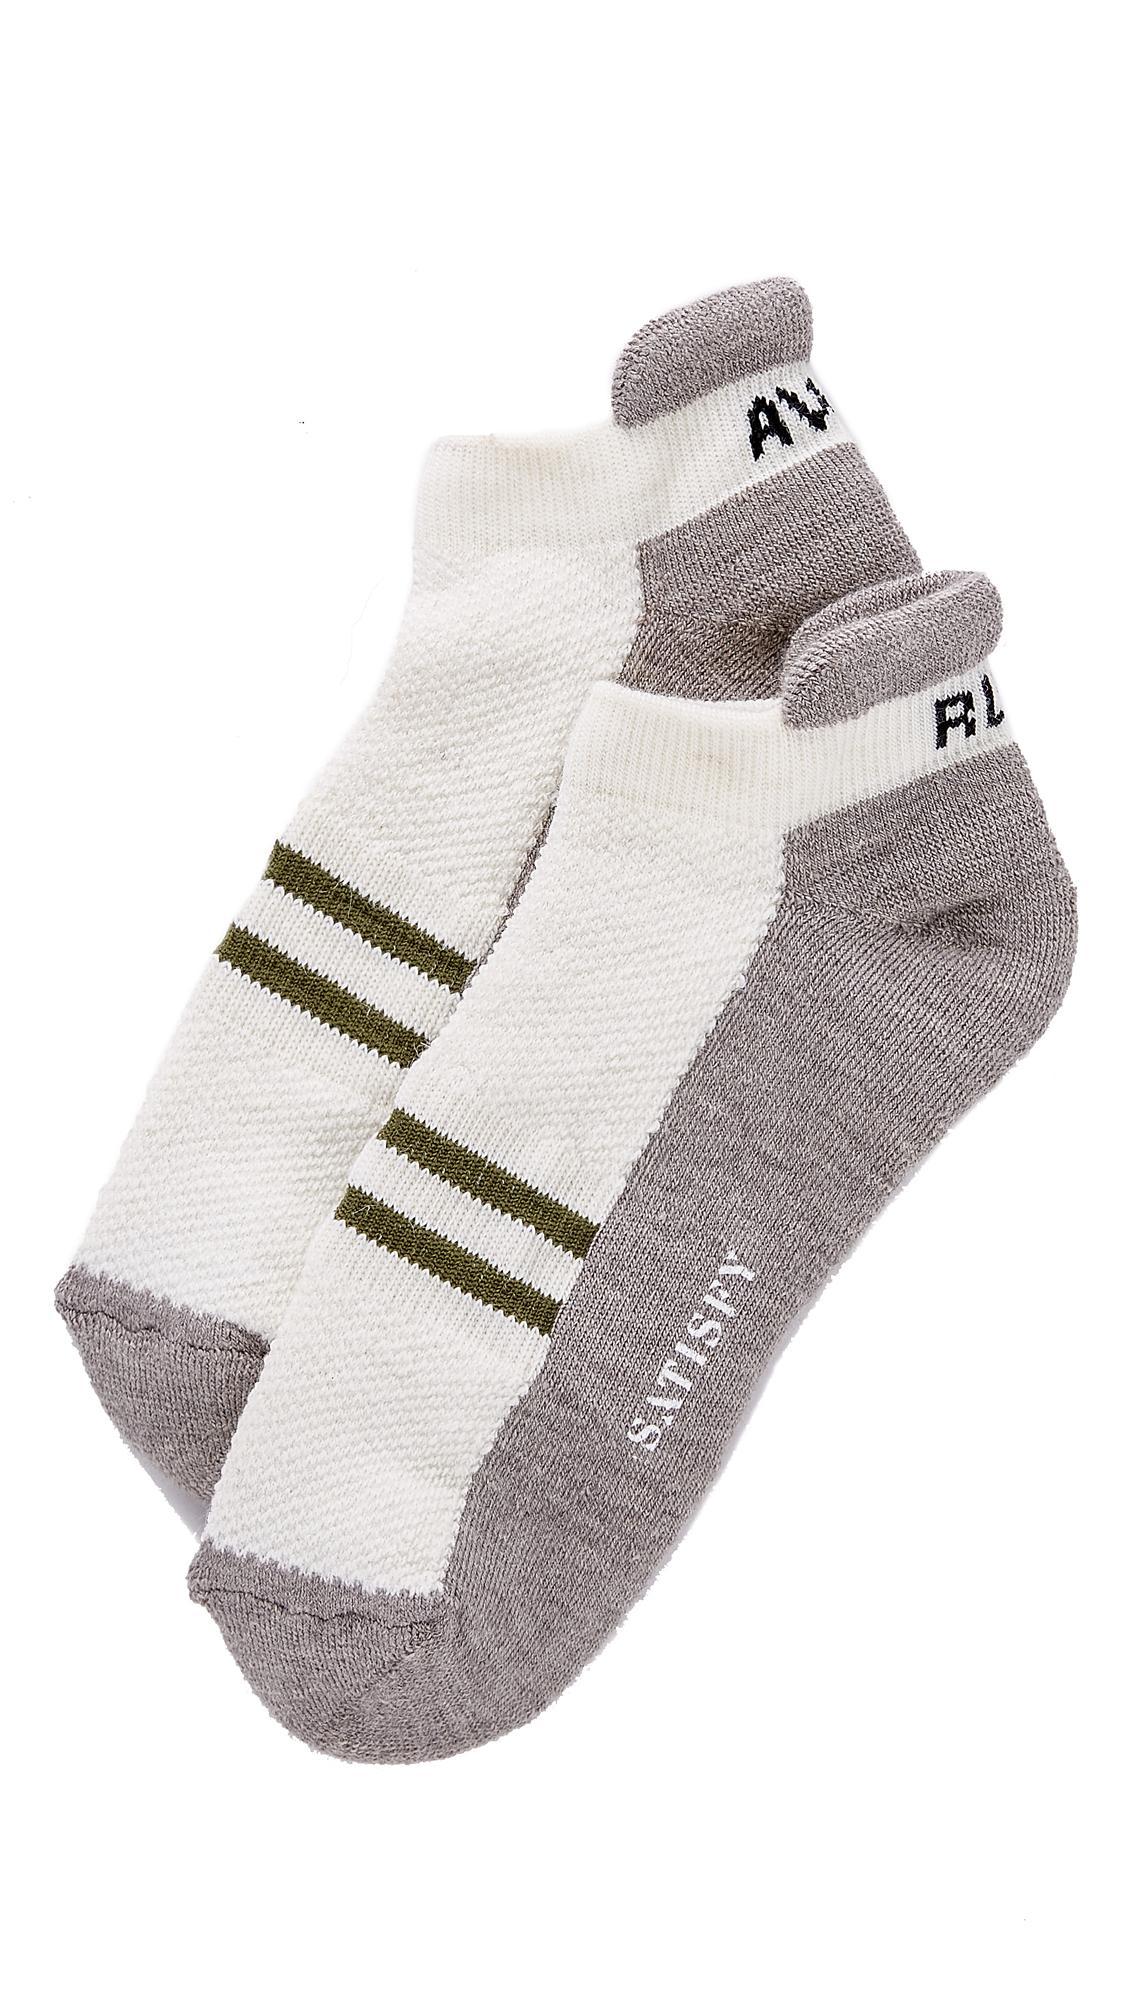 Satisfy Patchwork Ankle Socks In White